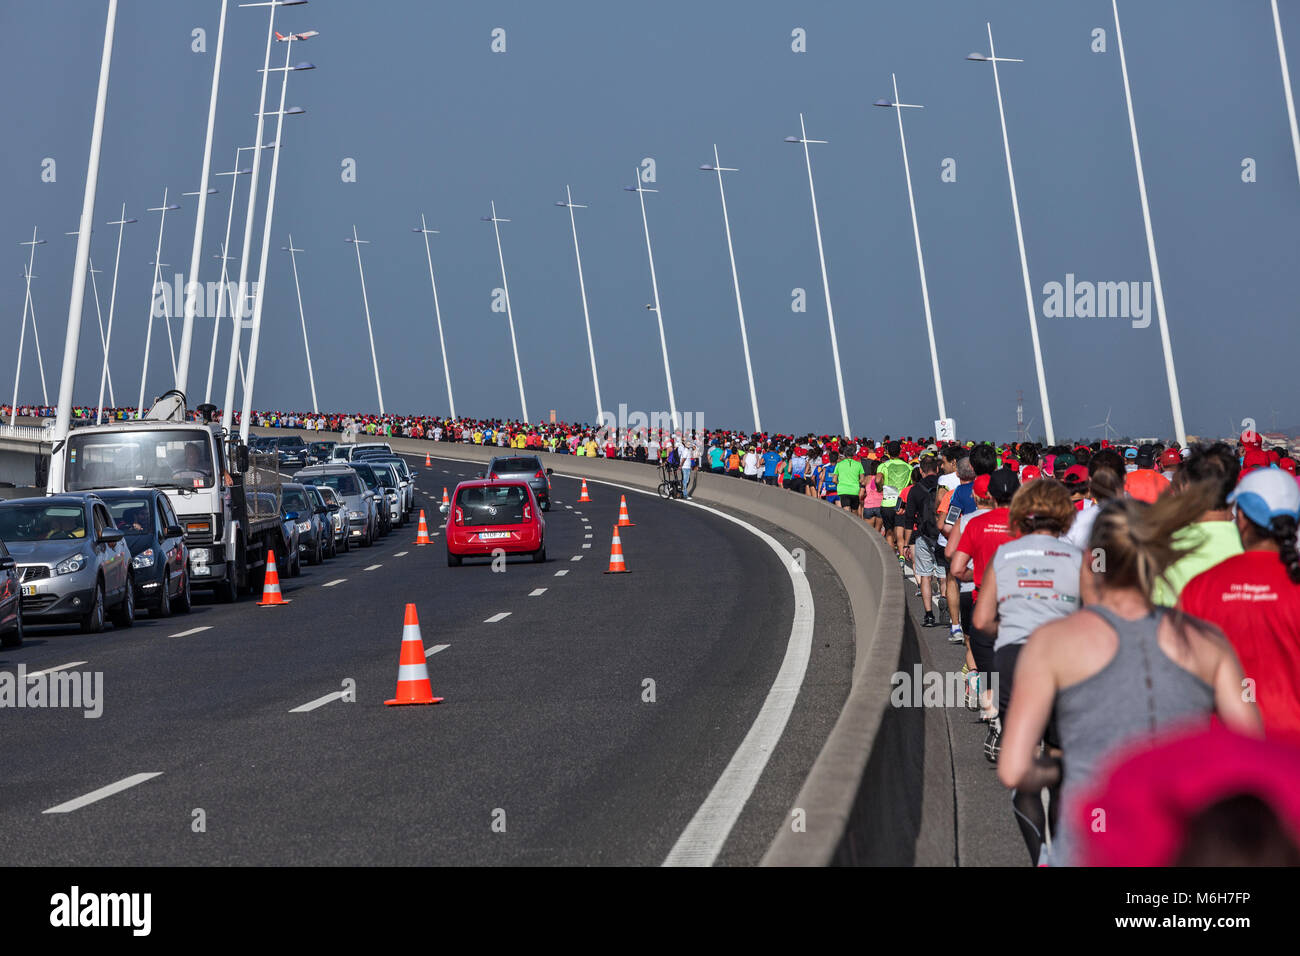 Runners on Vasca da Gama bridge at Lisbon Rock'n'Roll marathon 2017 - Stock Image